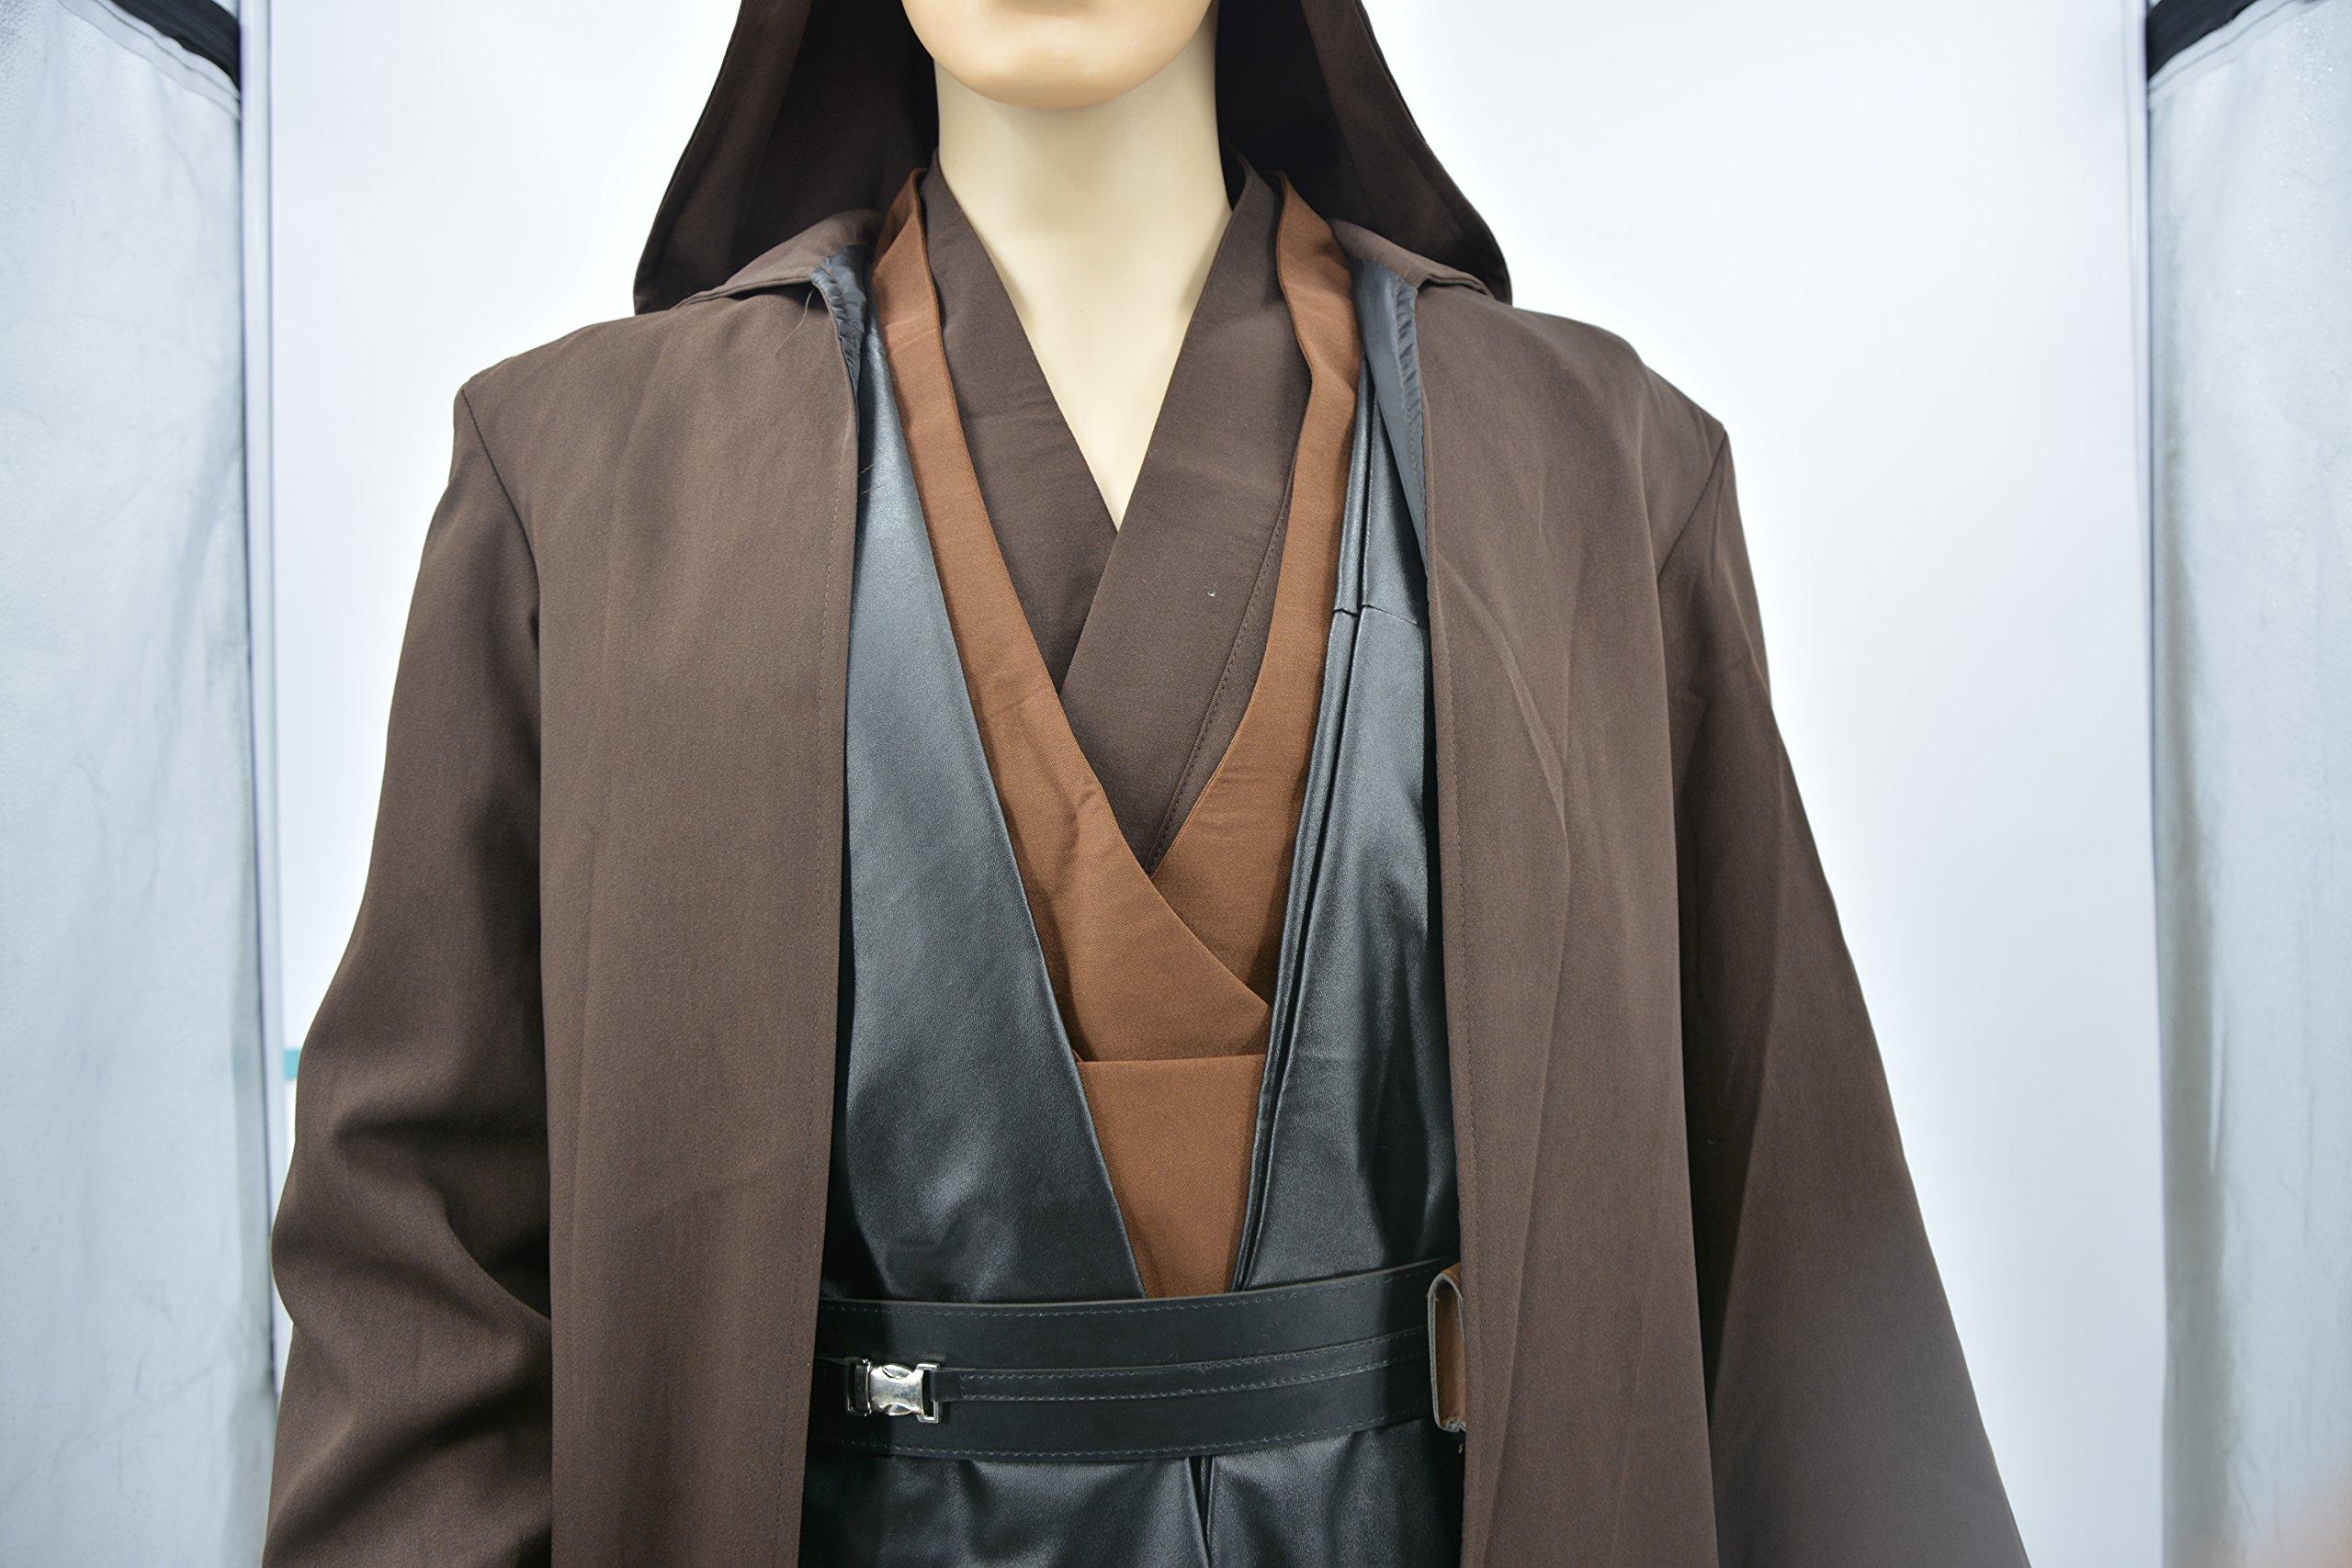 hideaway Star Wars Adult Deluxe Anakin Skywalker Costume [ Size : M, L, XL ] Cosplay (XL) by hideaway (Image #4)